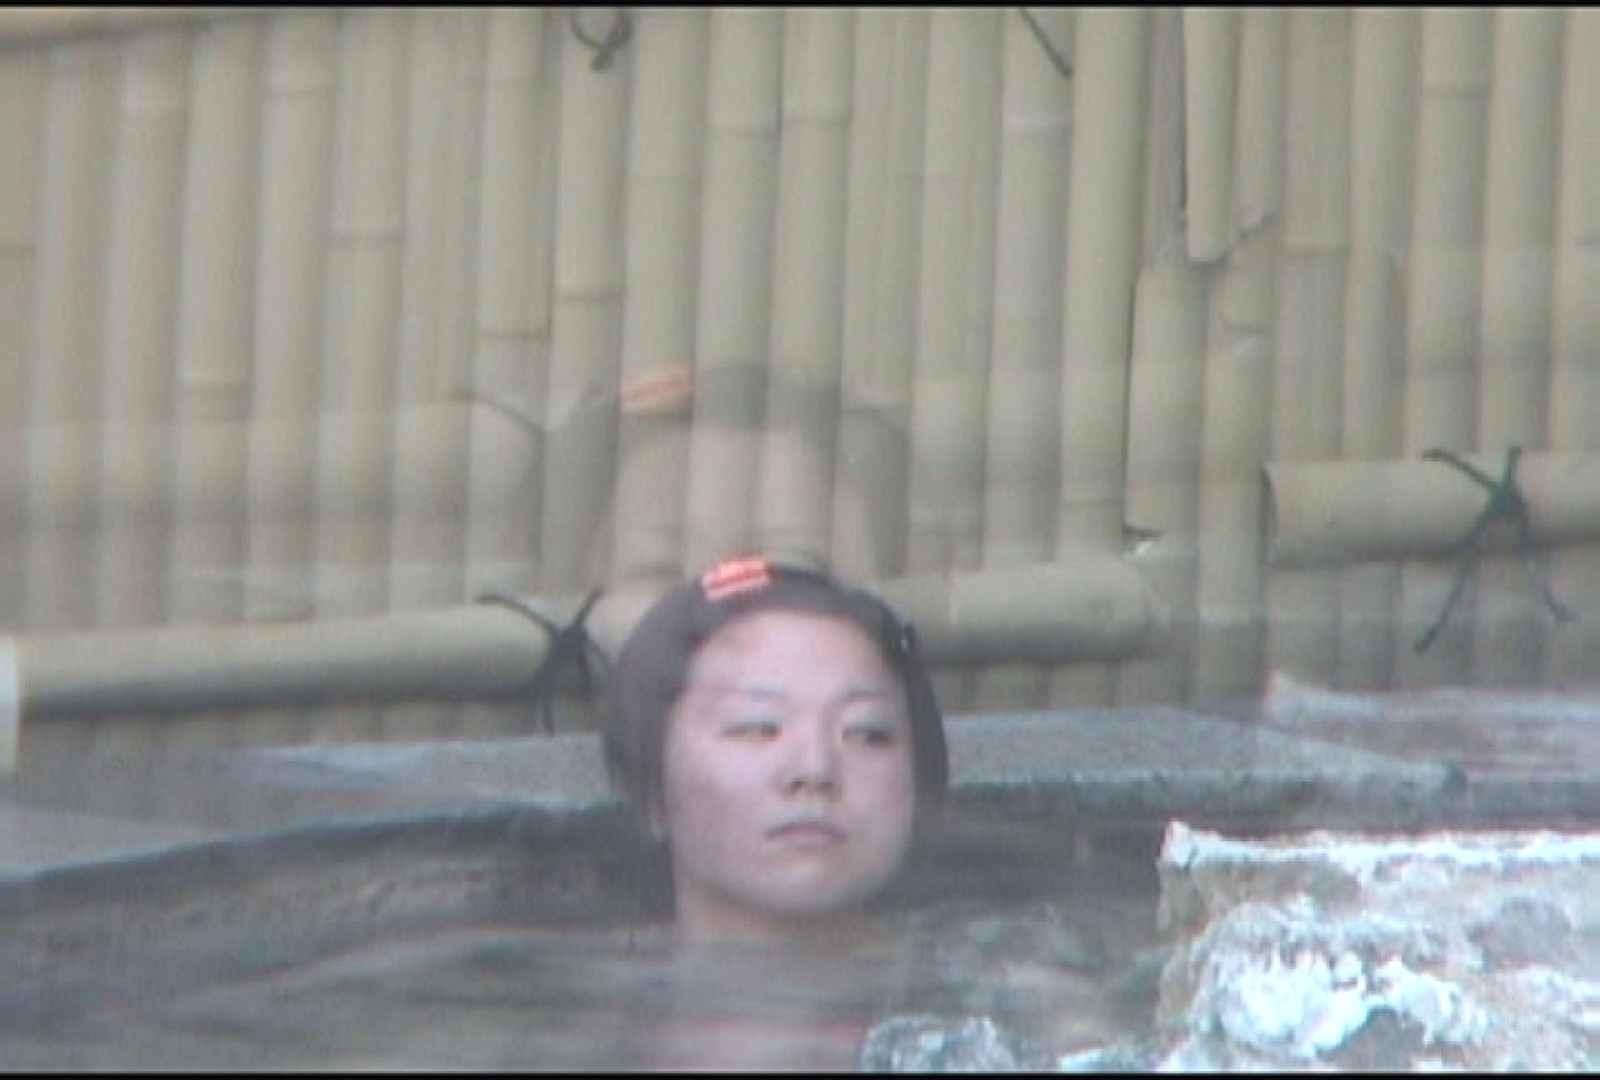 Aquaな露天風呂Vol.175 OLのエロ生活 | 露天風呂  71連発 67